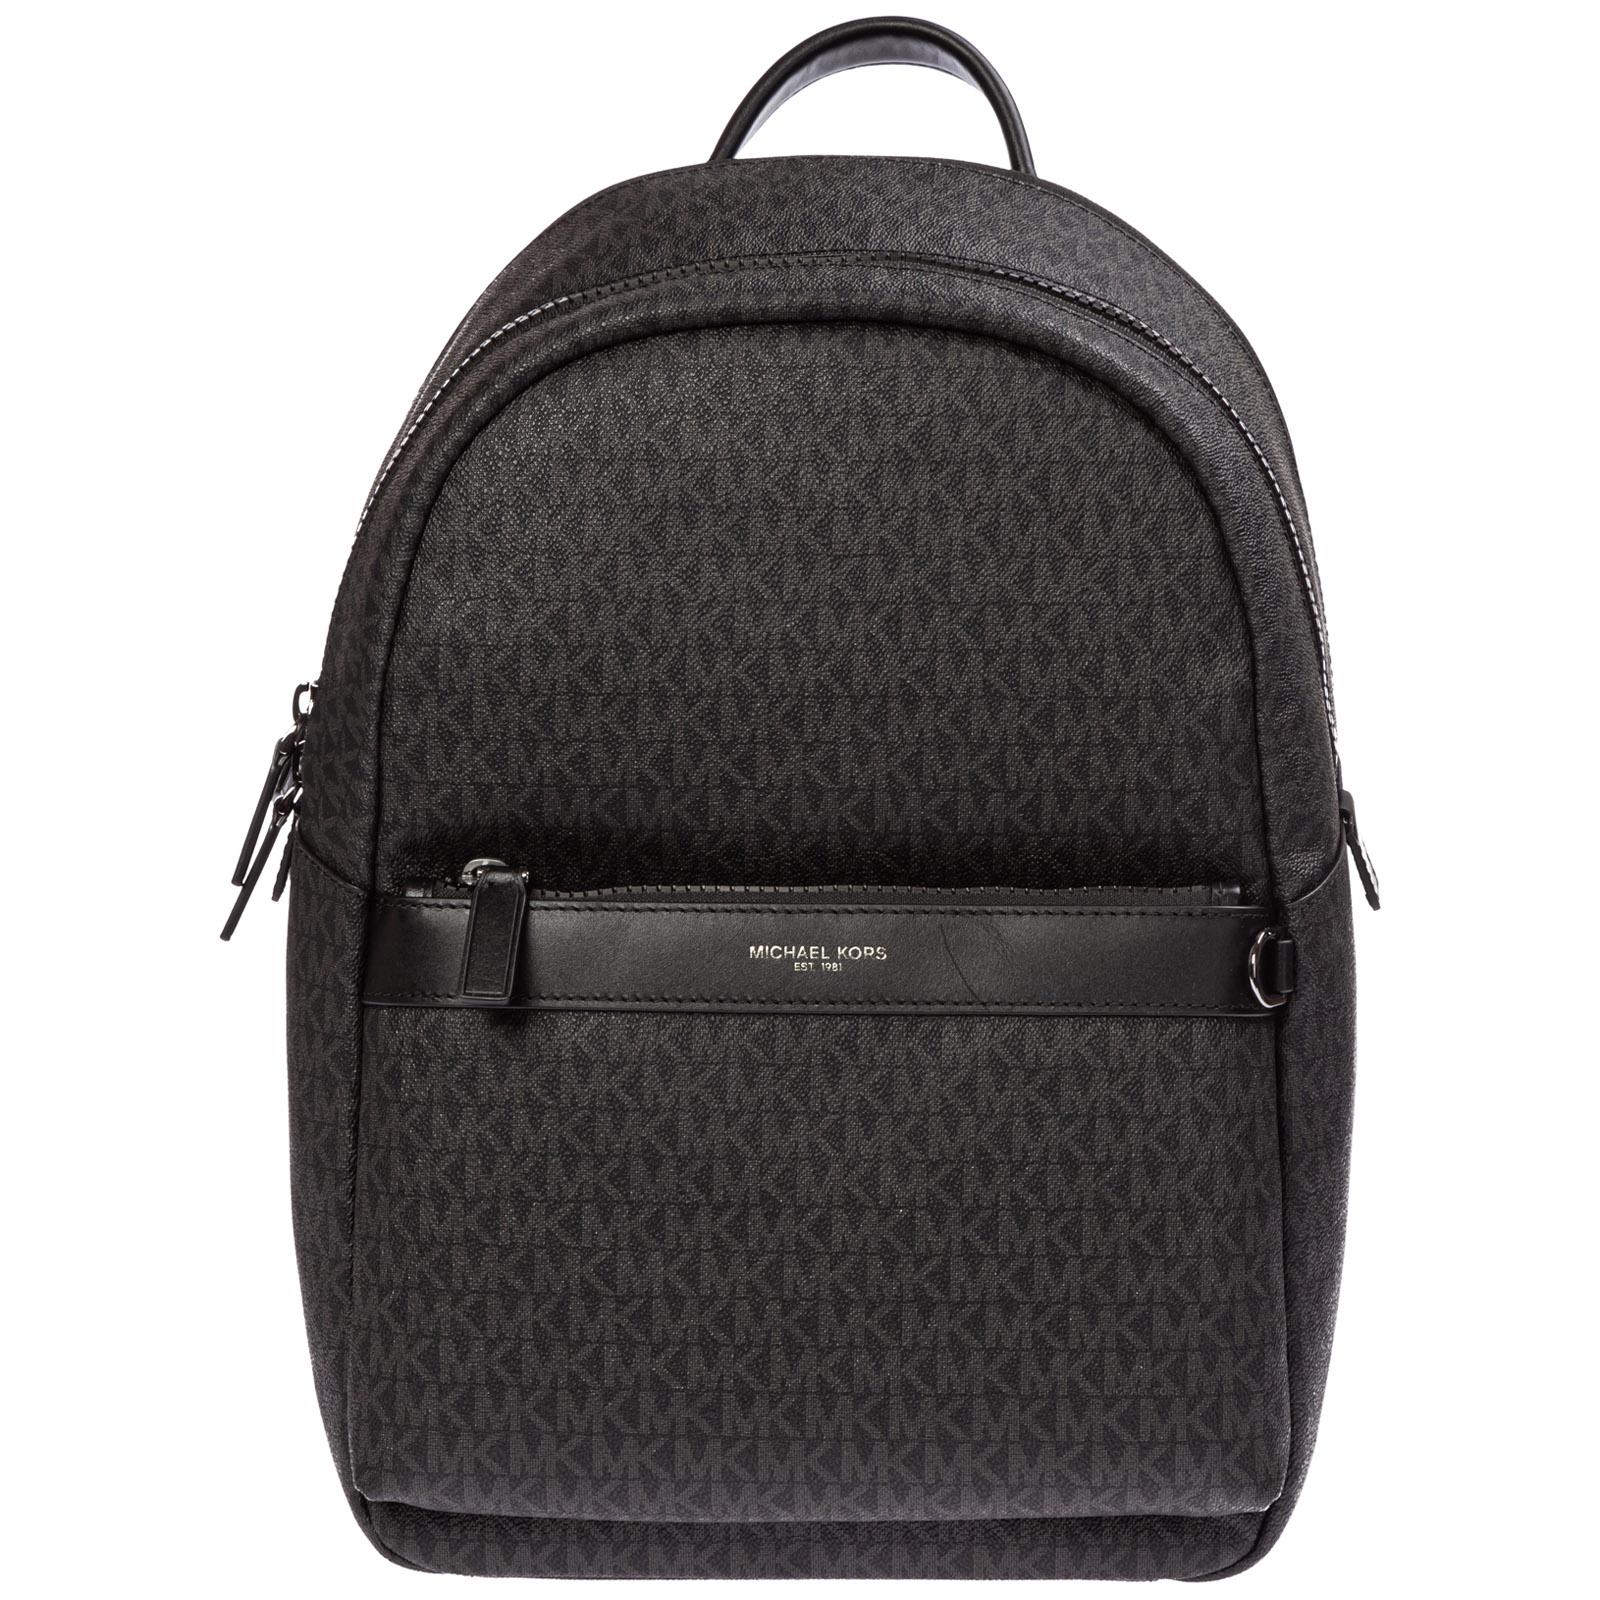 design senza tempo 3a0b2 2fcd6 Backpack Michael Kors greyson 33f9lgyb20 001 nero   FRMODA.com